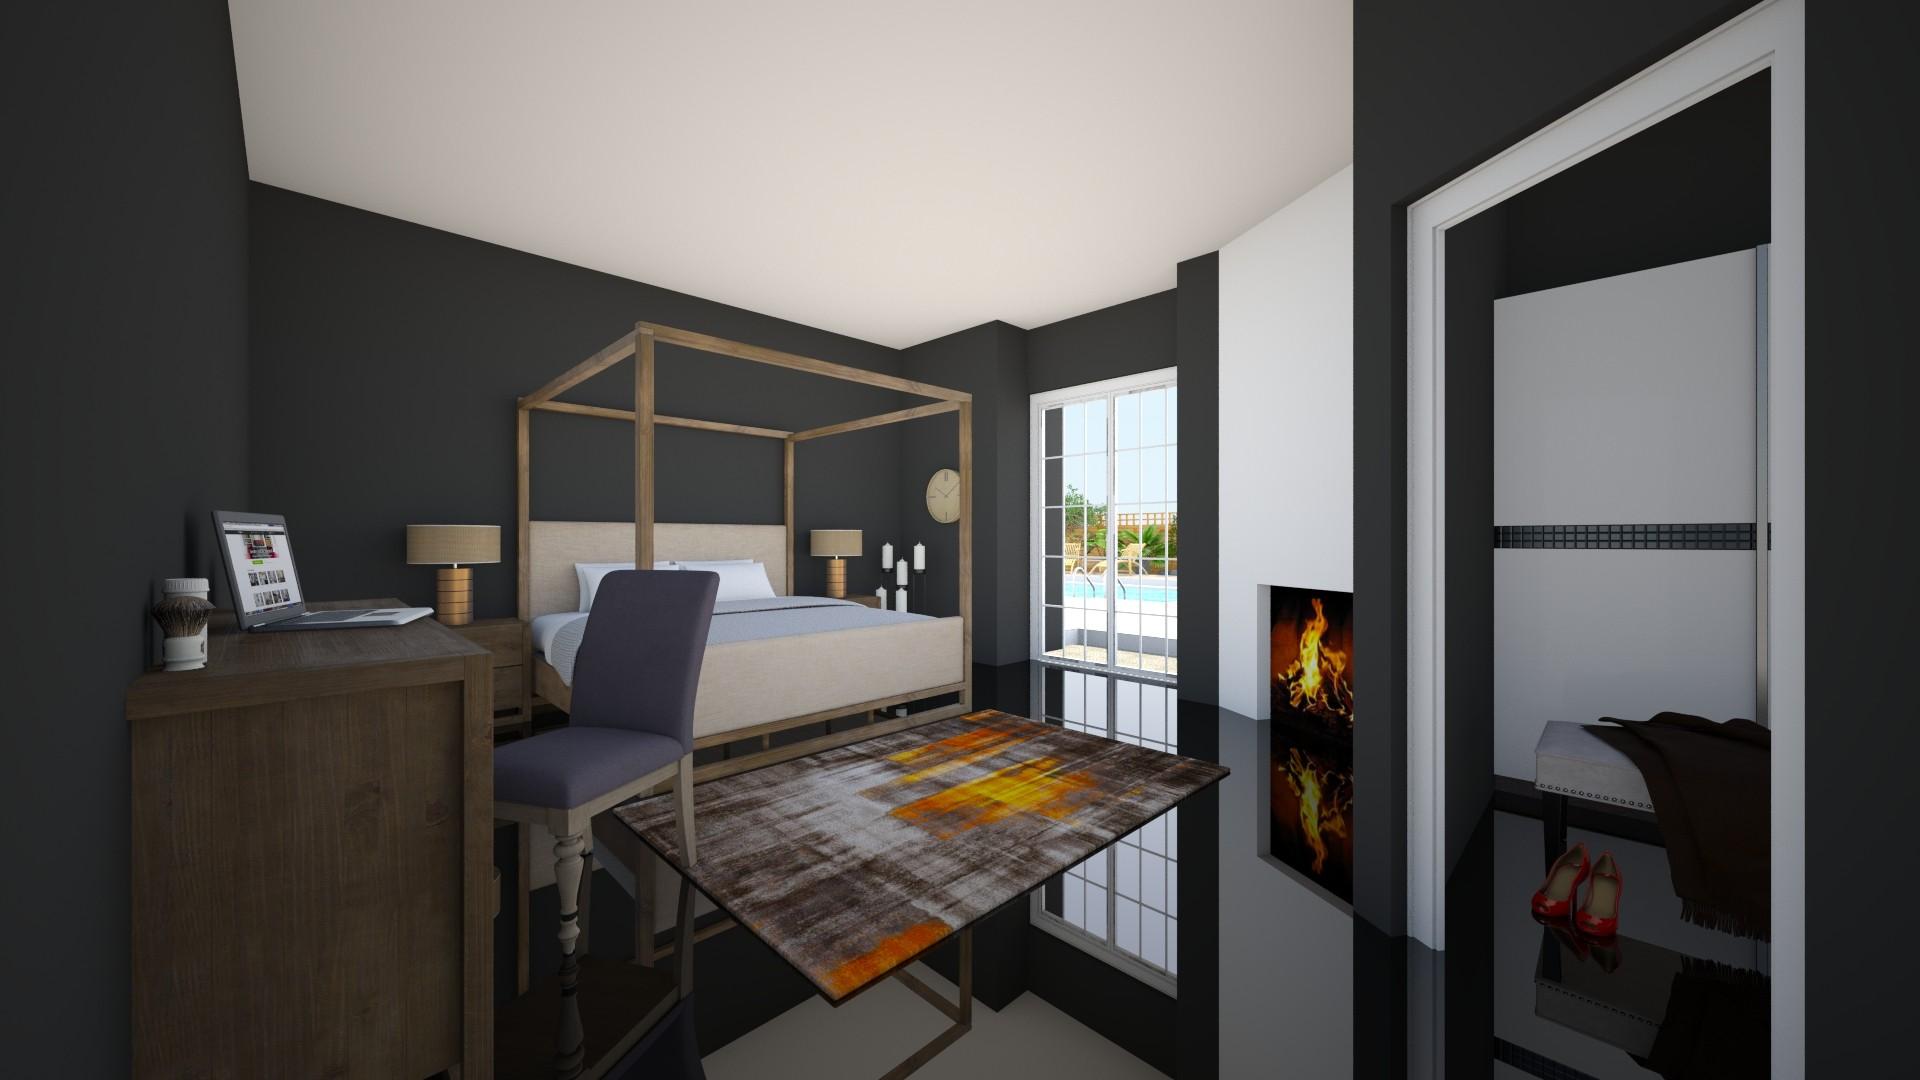 nedin - Modern - Bedroom - by ned31